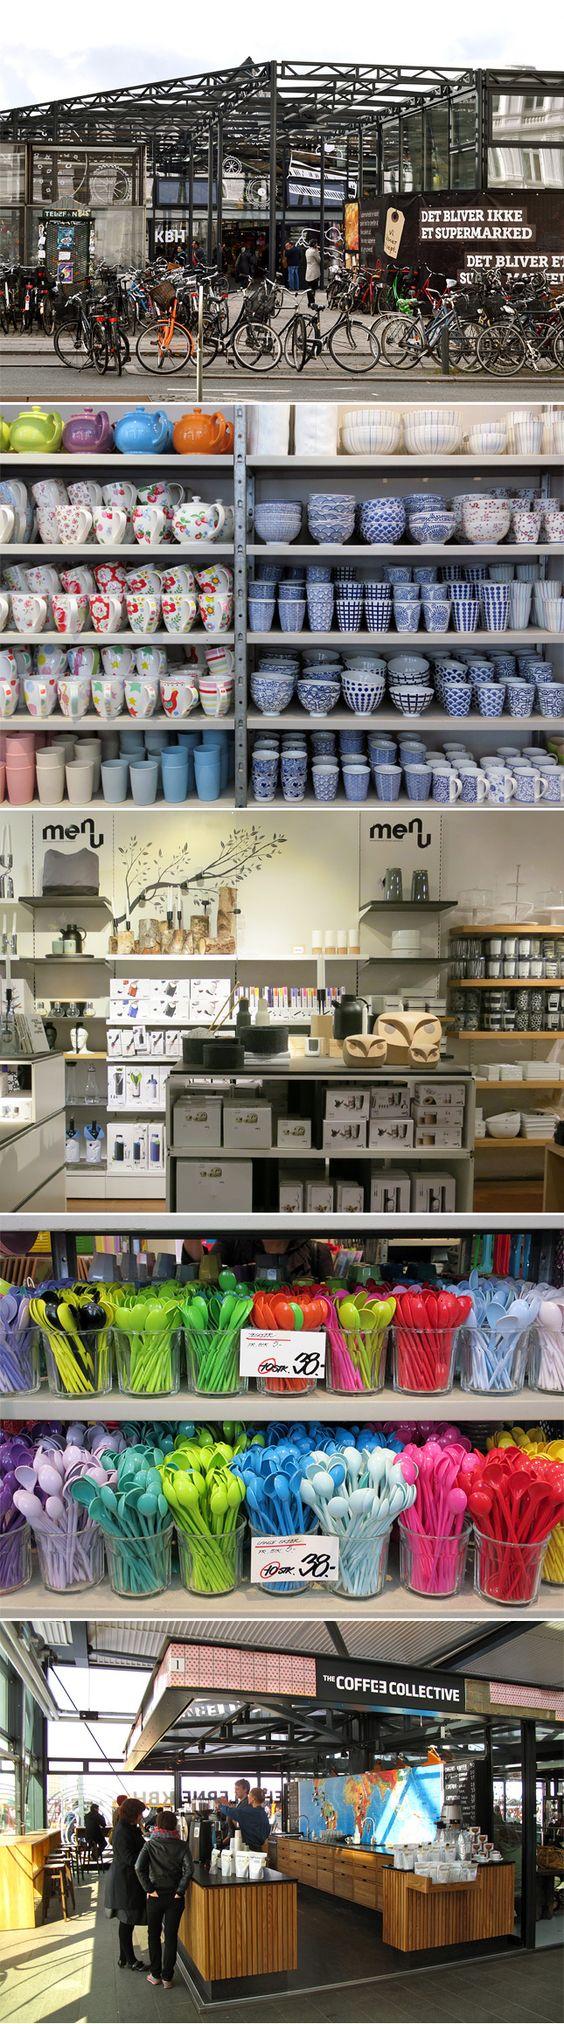 Top Five Stores for Food, Craft, and Design Lovers in Copenhagen